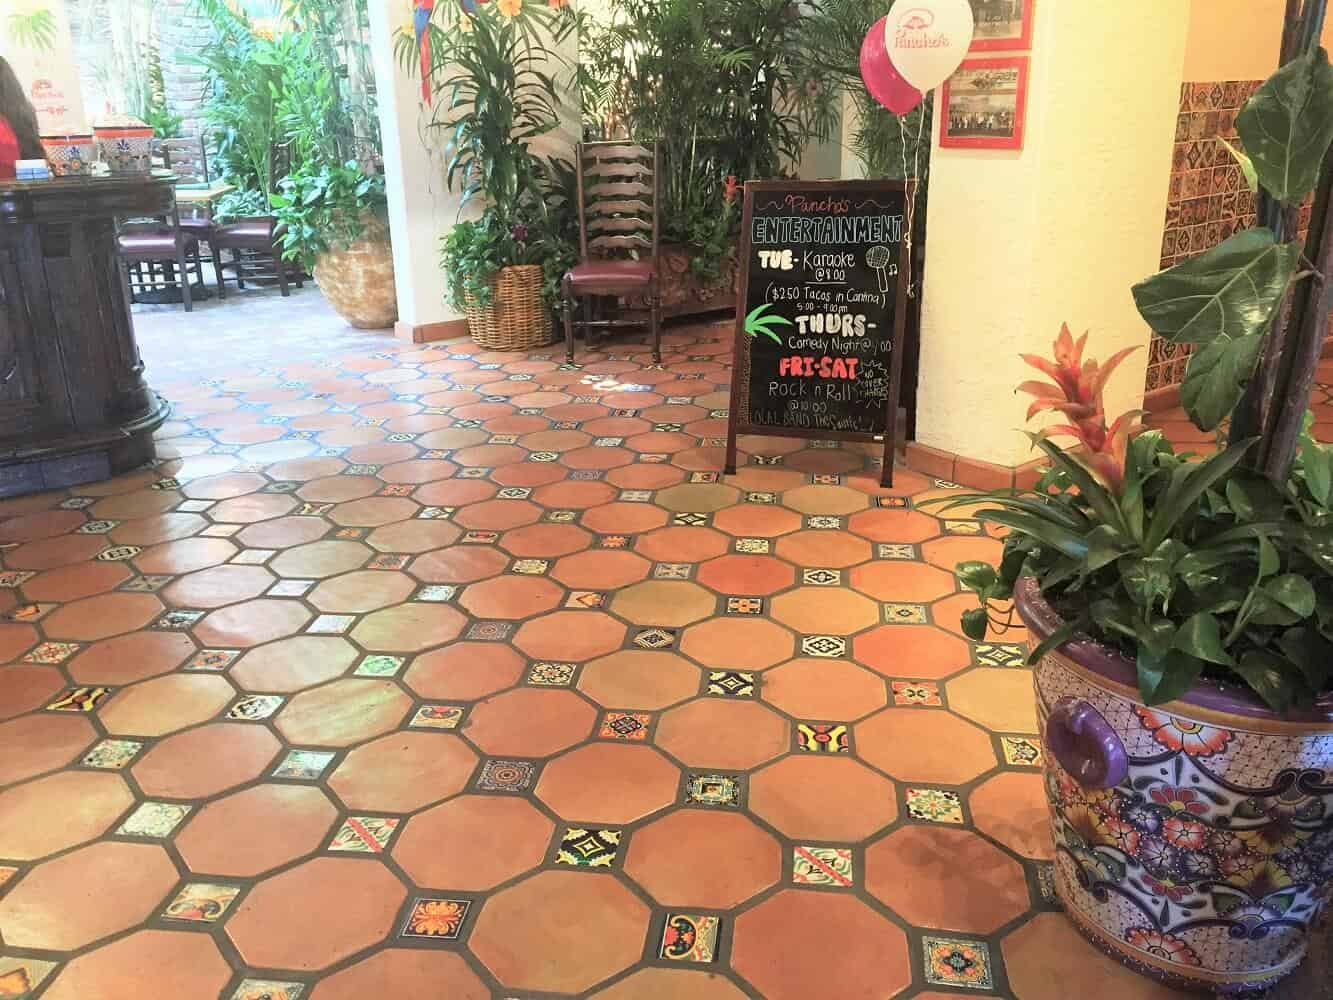 octagon saltillo tile 12x12 terracotta floor tile mexican pavers